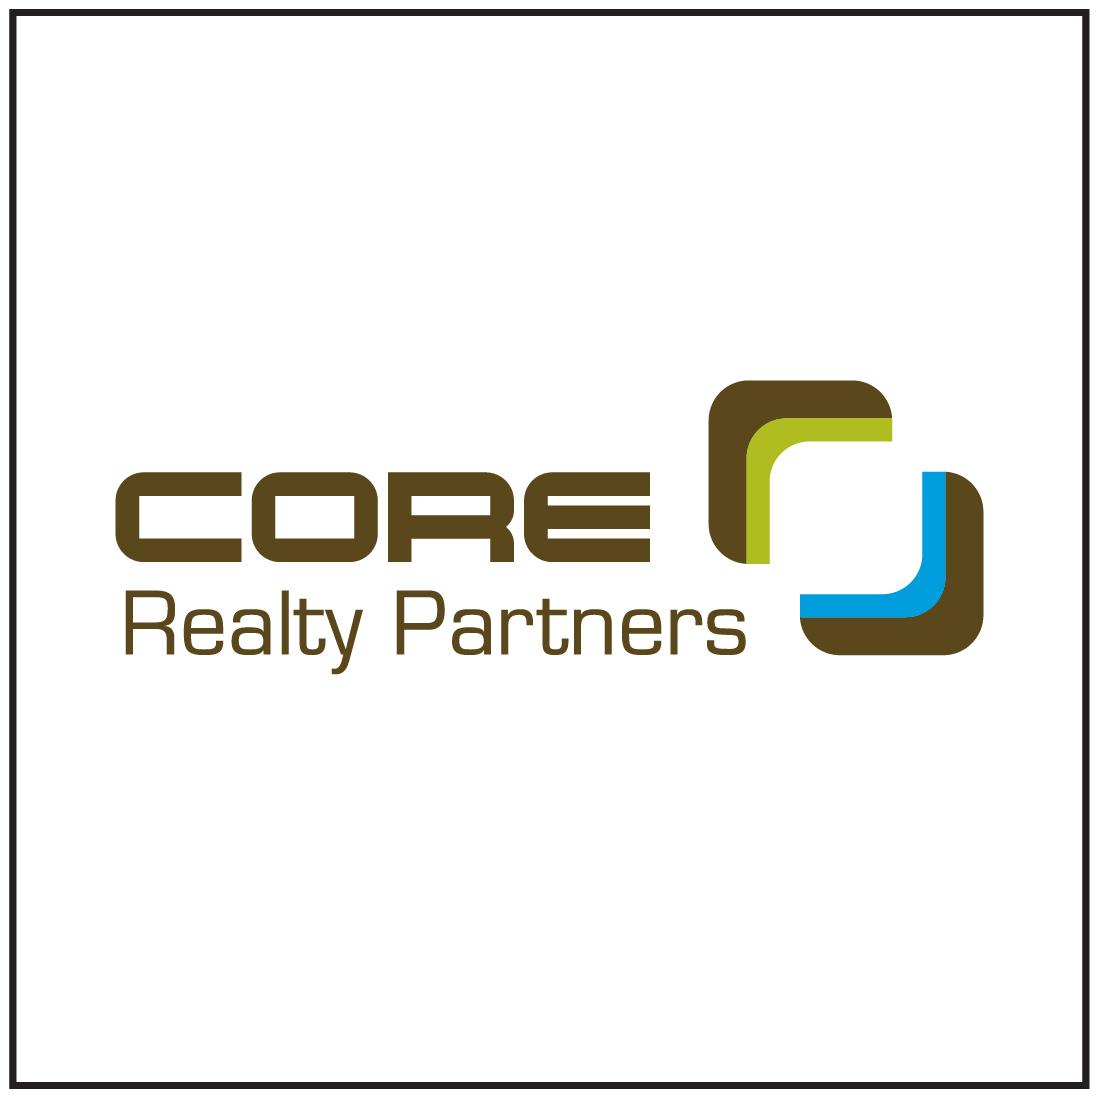 Logo-SM-CoreRealty.jpg